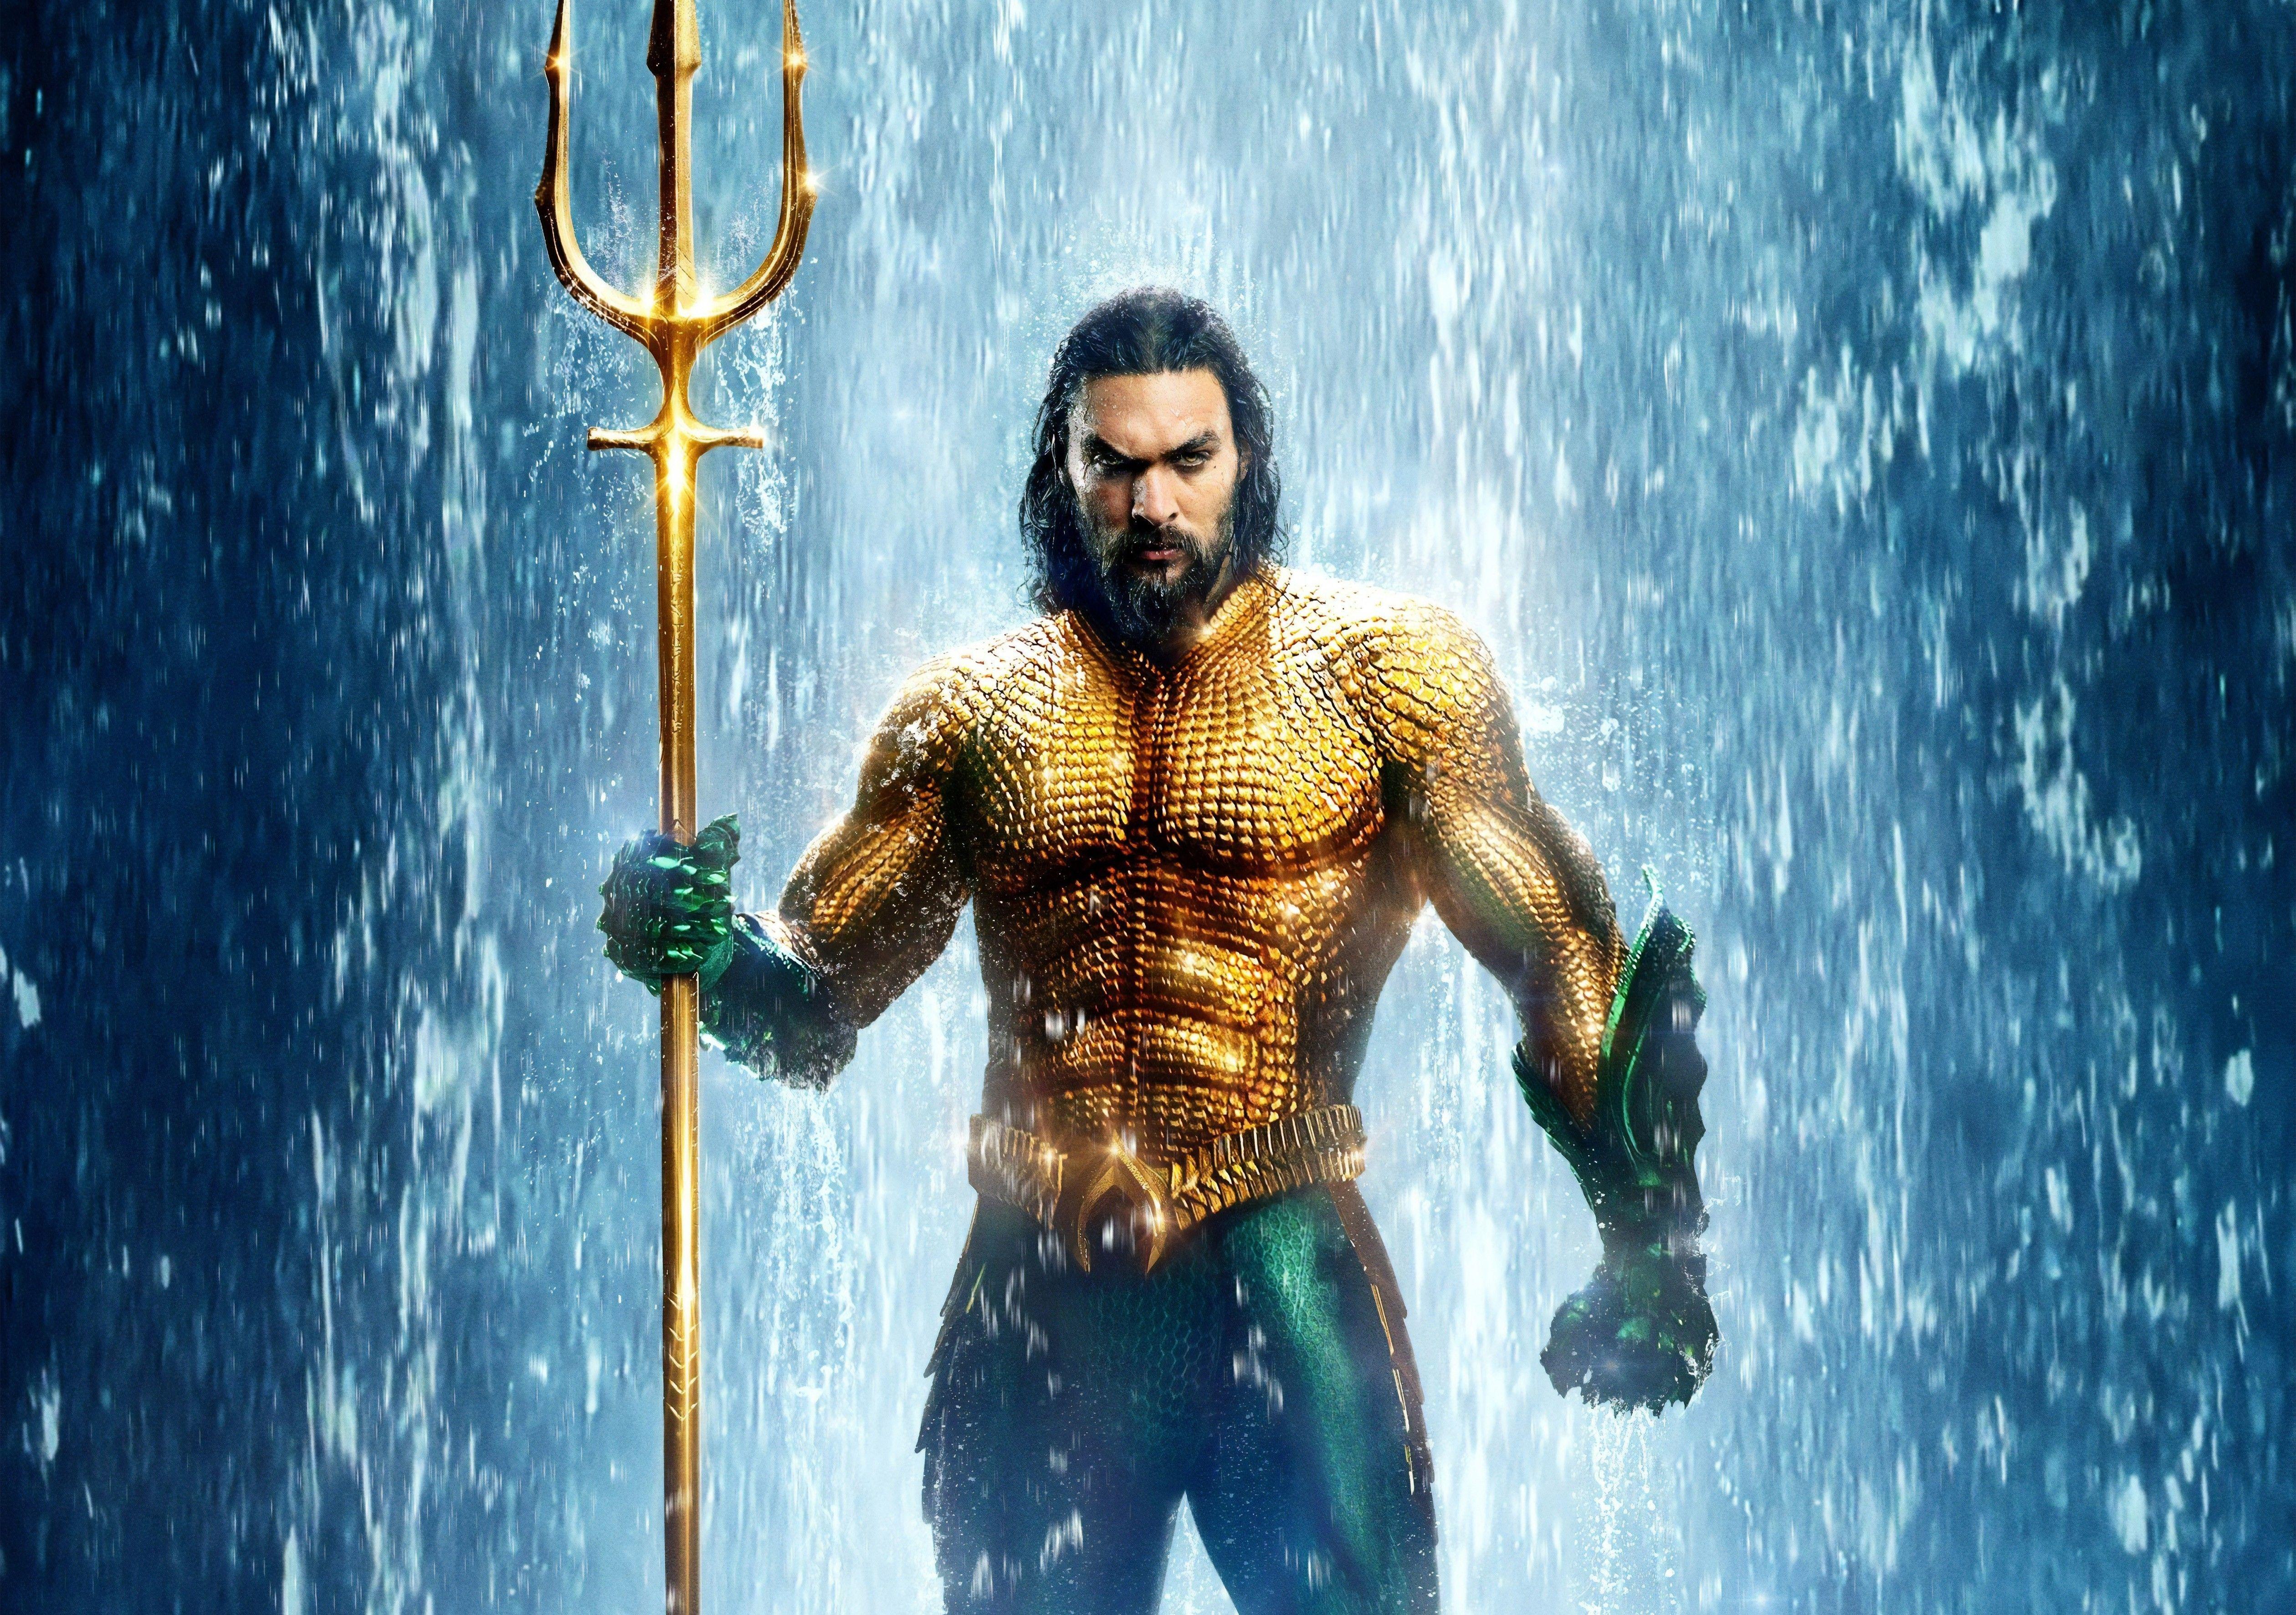 Jason Momoa Aquaman Wallpapers Top Free Jason Momoa Aquaman